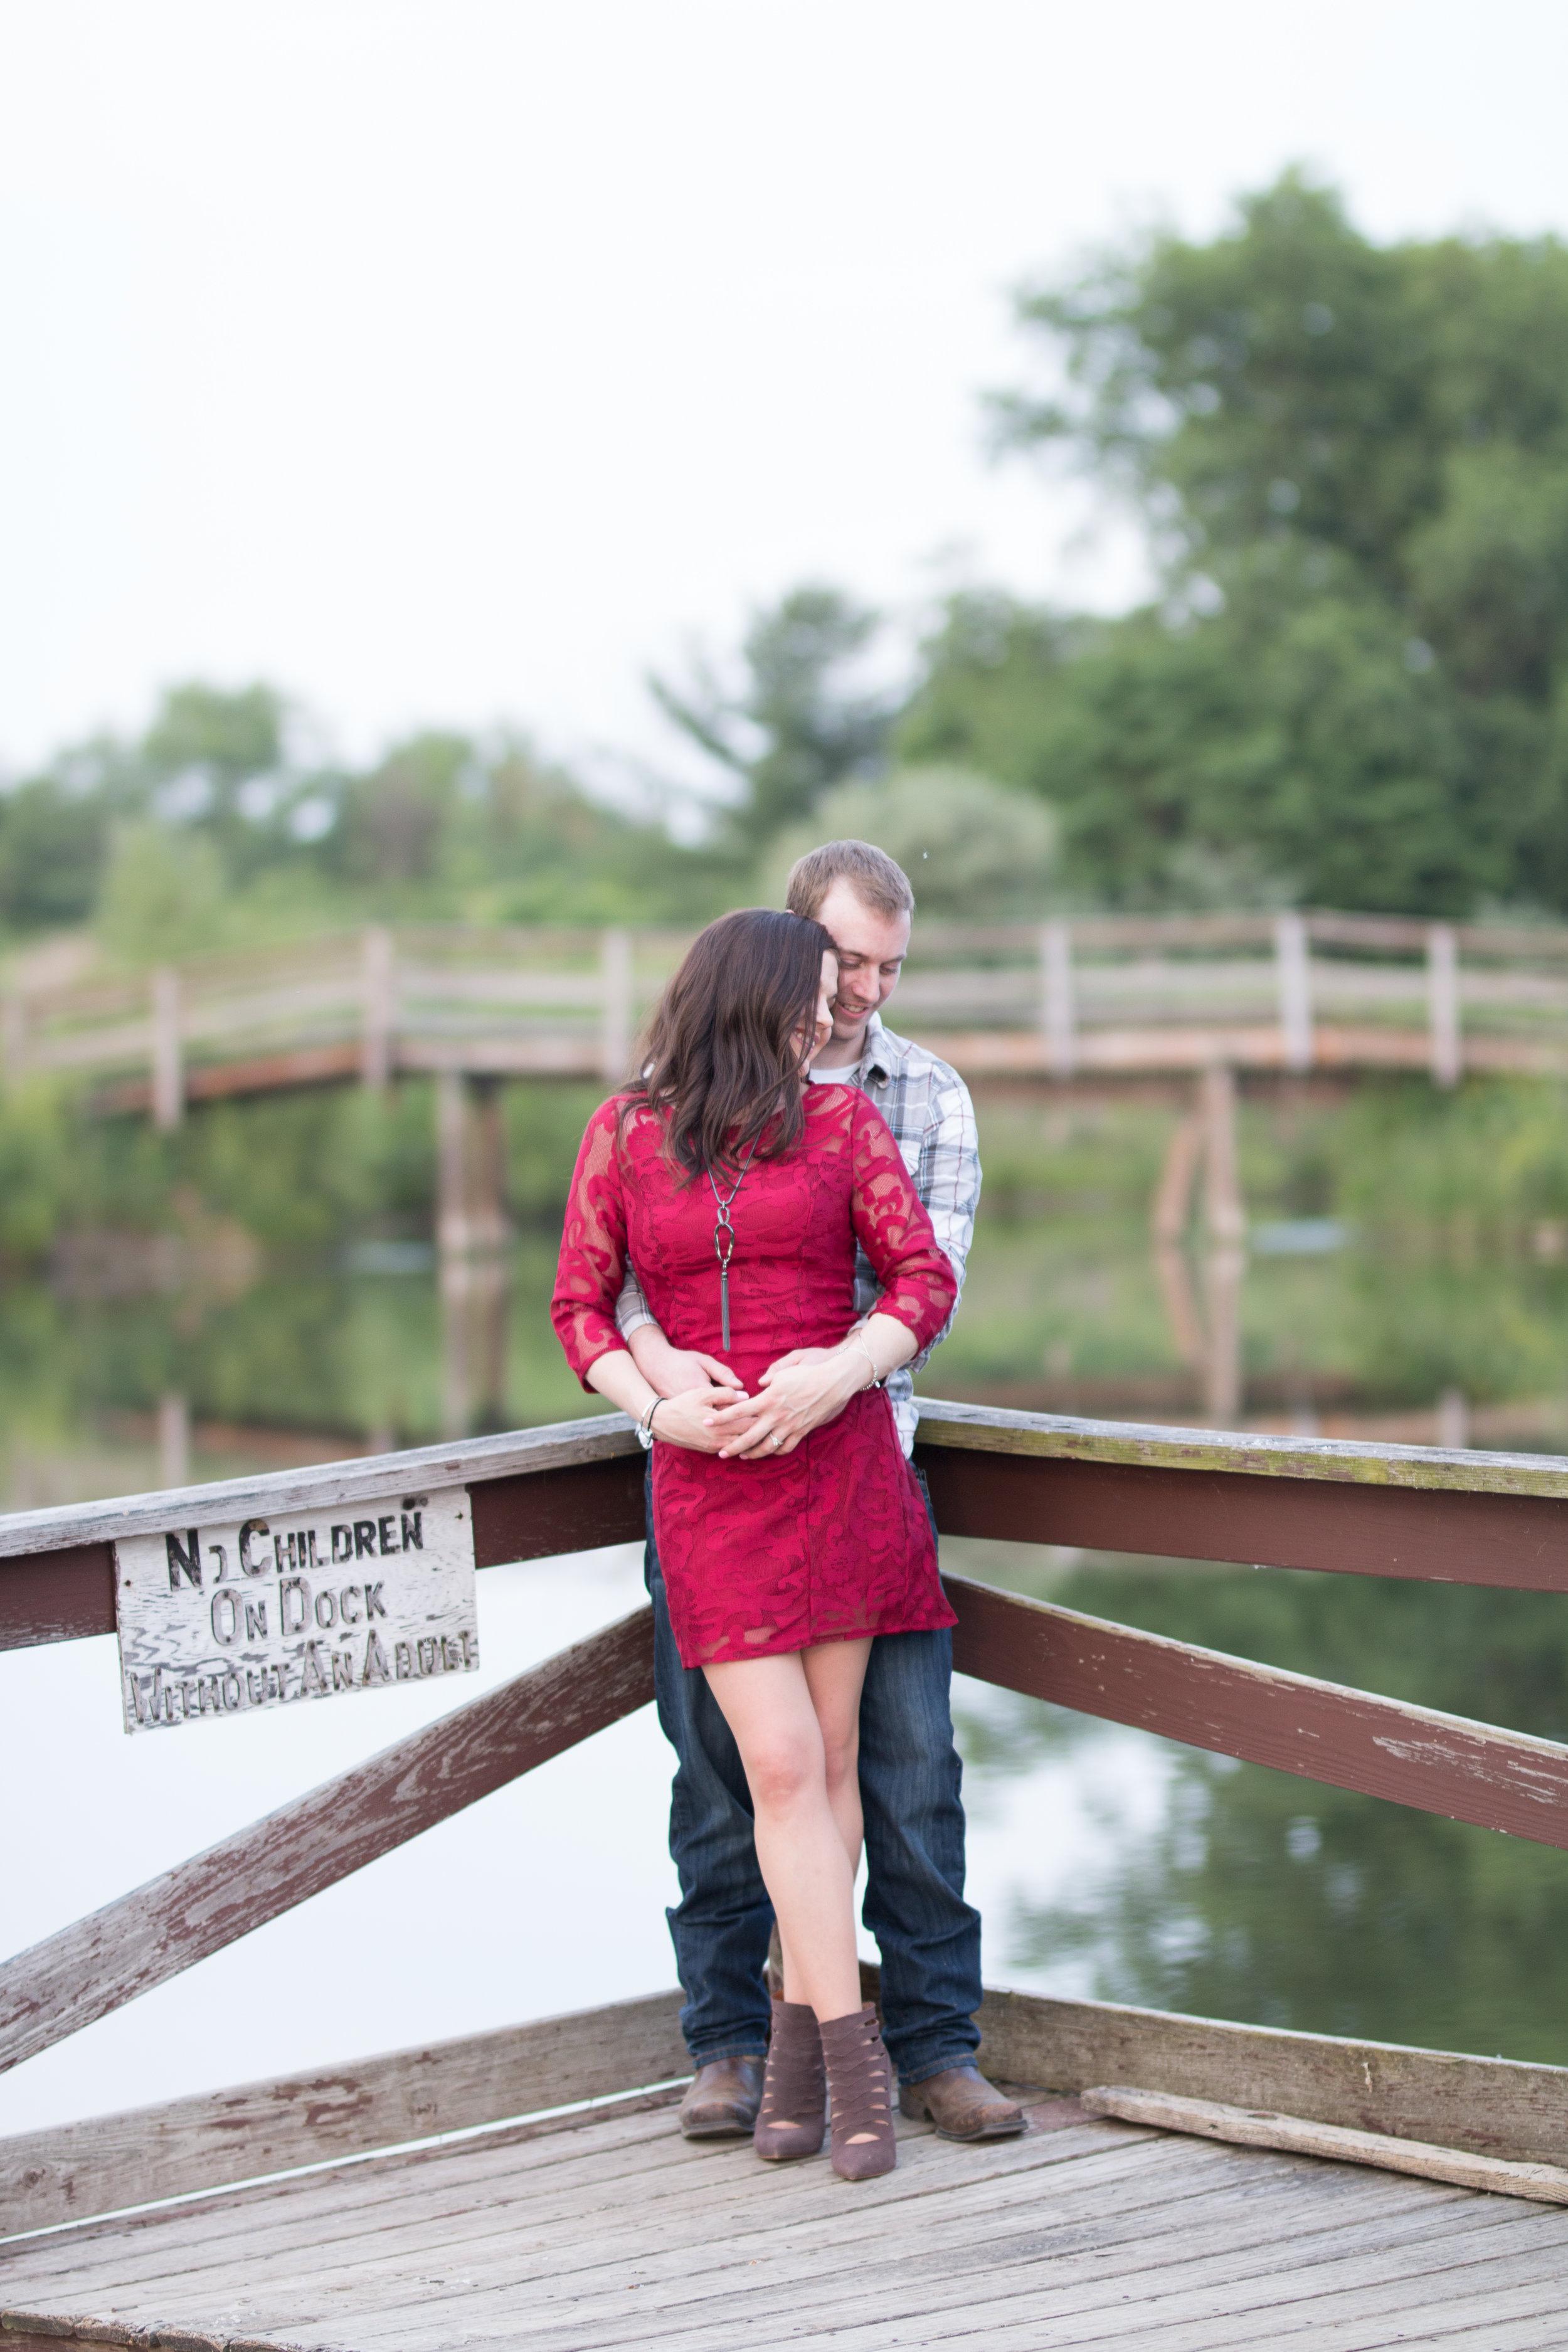 Blake & Abbie_Engagement_552 - 20170604-30.jpg